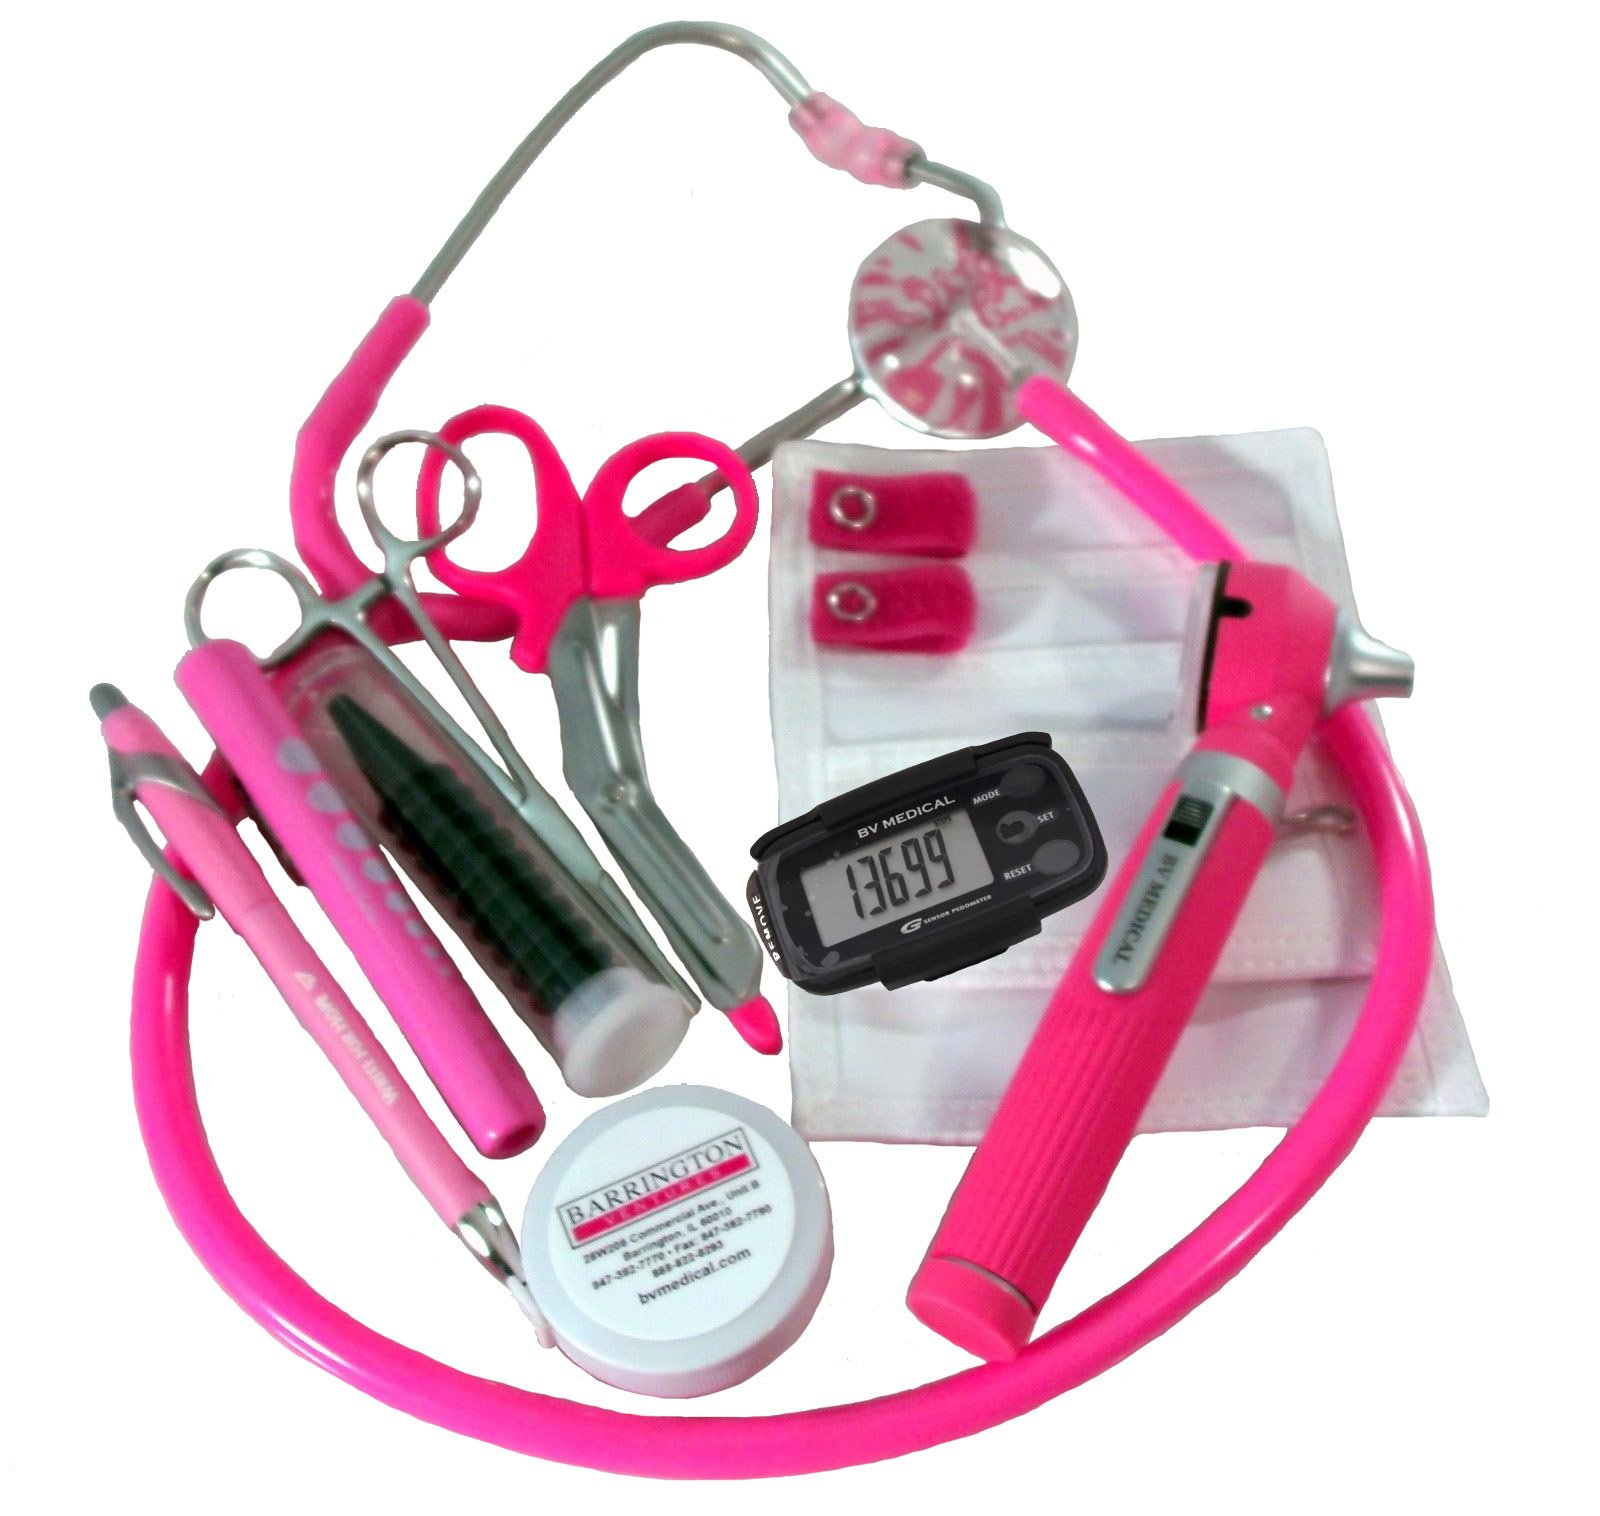 Breast Cancer Awareness Nurse Kit with W/ Mini Otoscope, Hot Pink Stethoscope